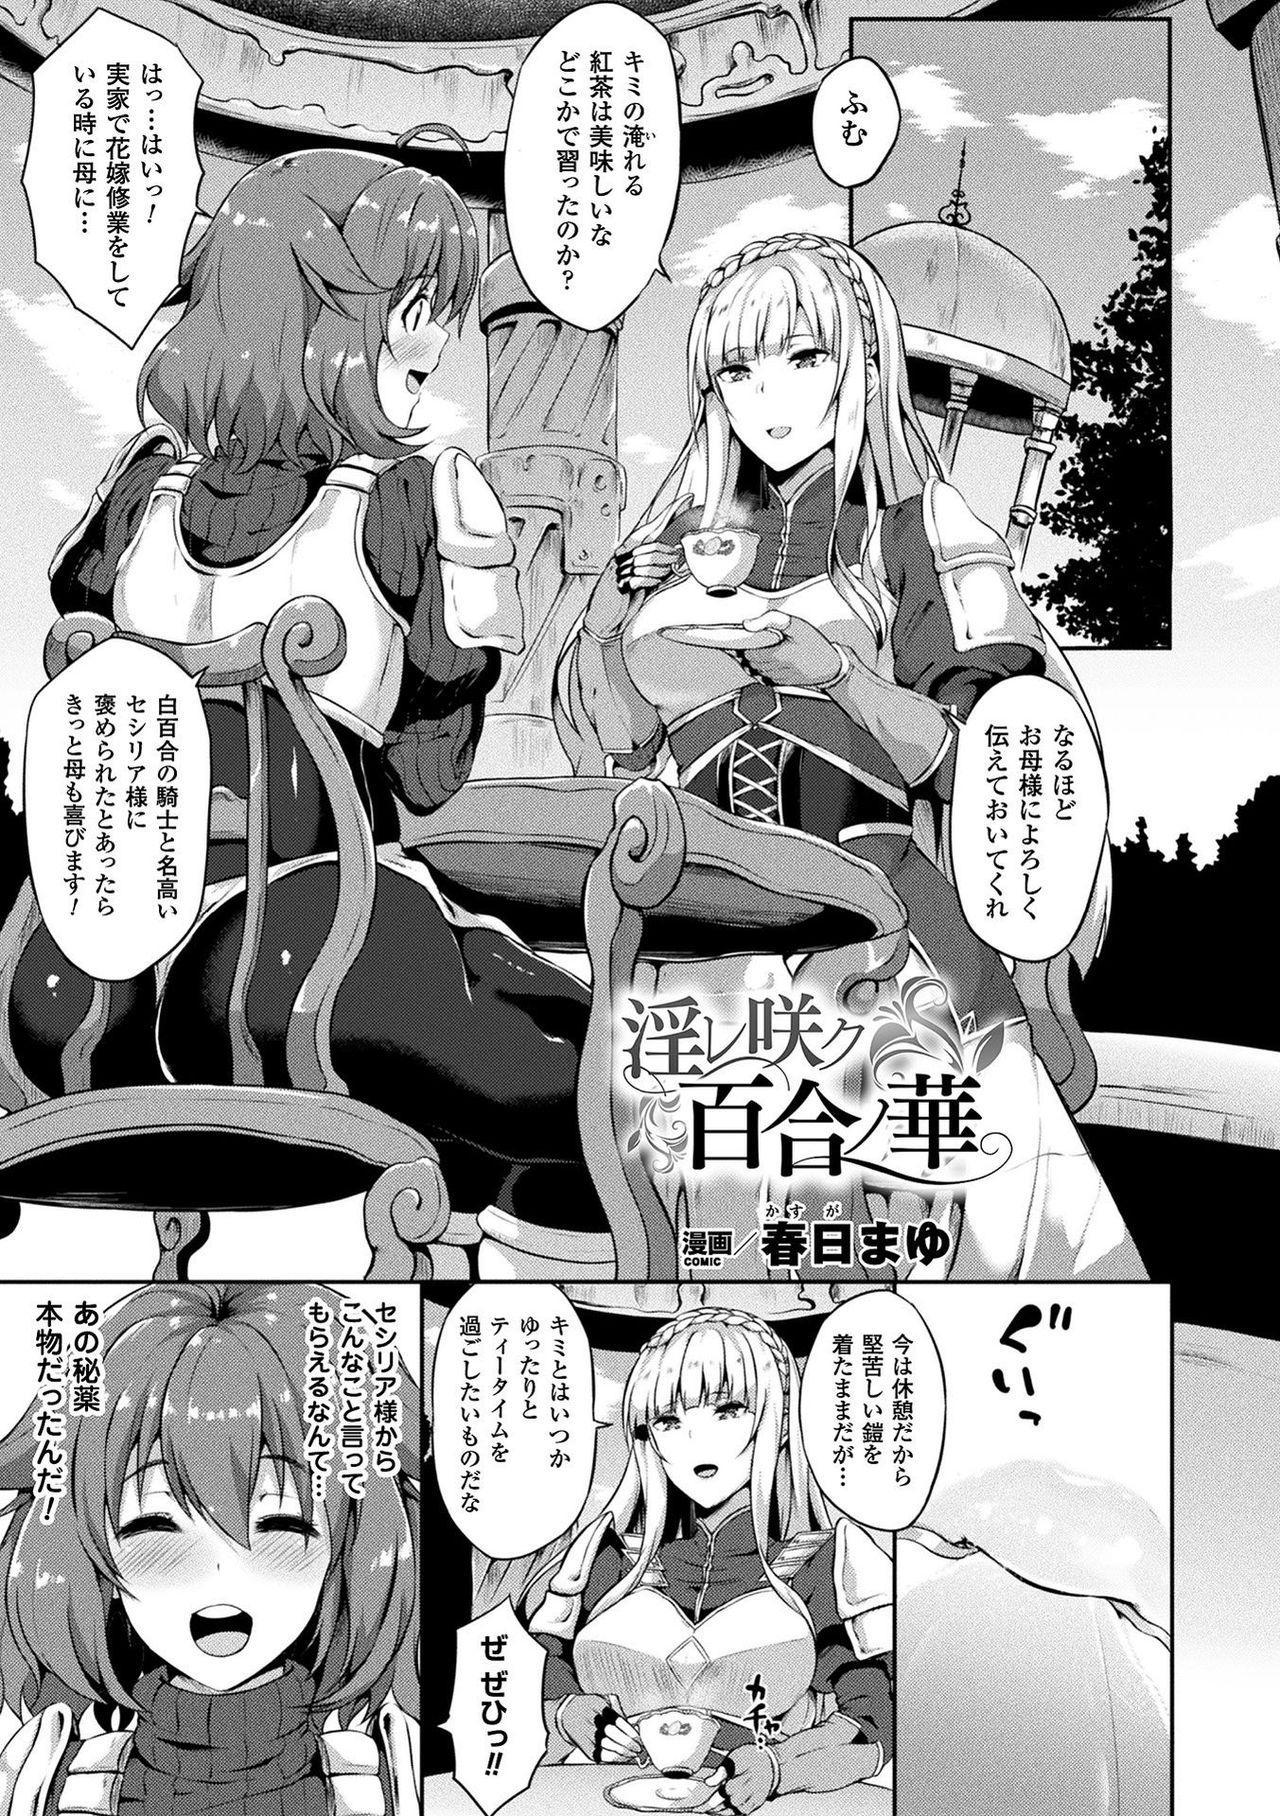 Comic Unreal The Best Futanari Collection 148